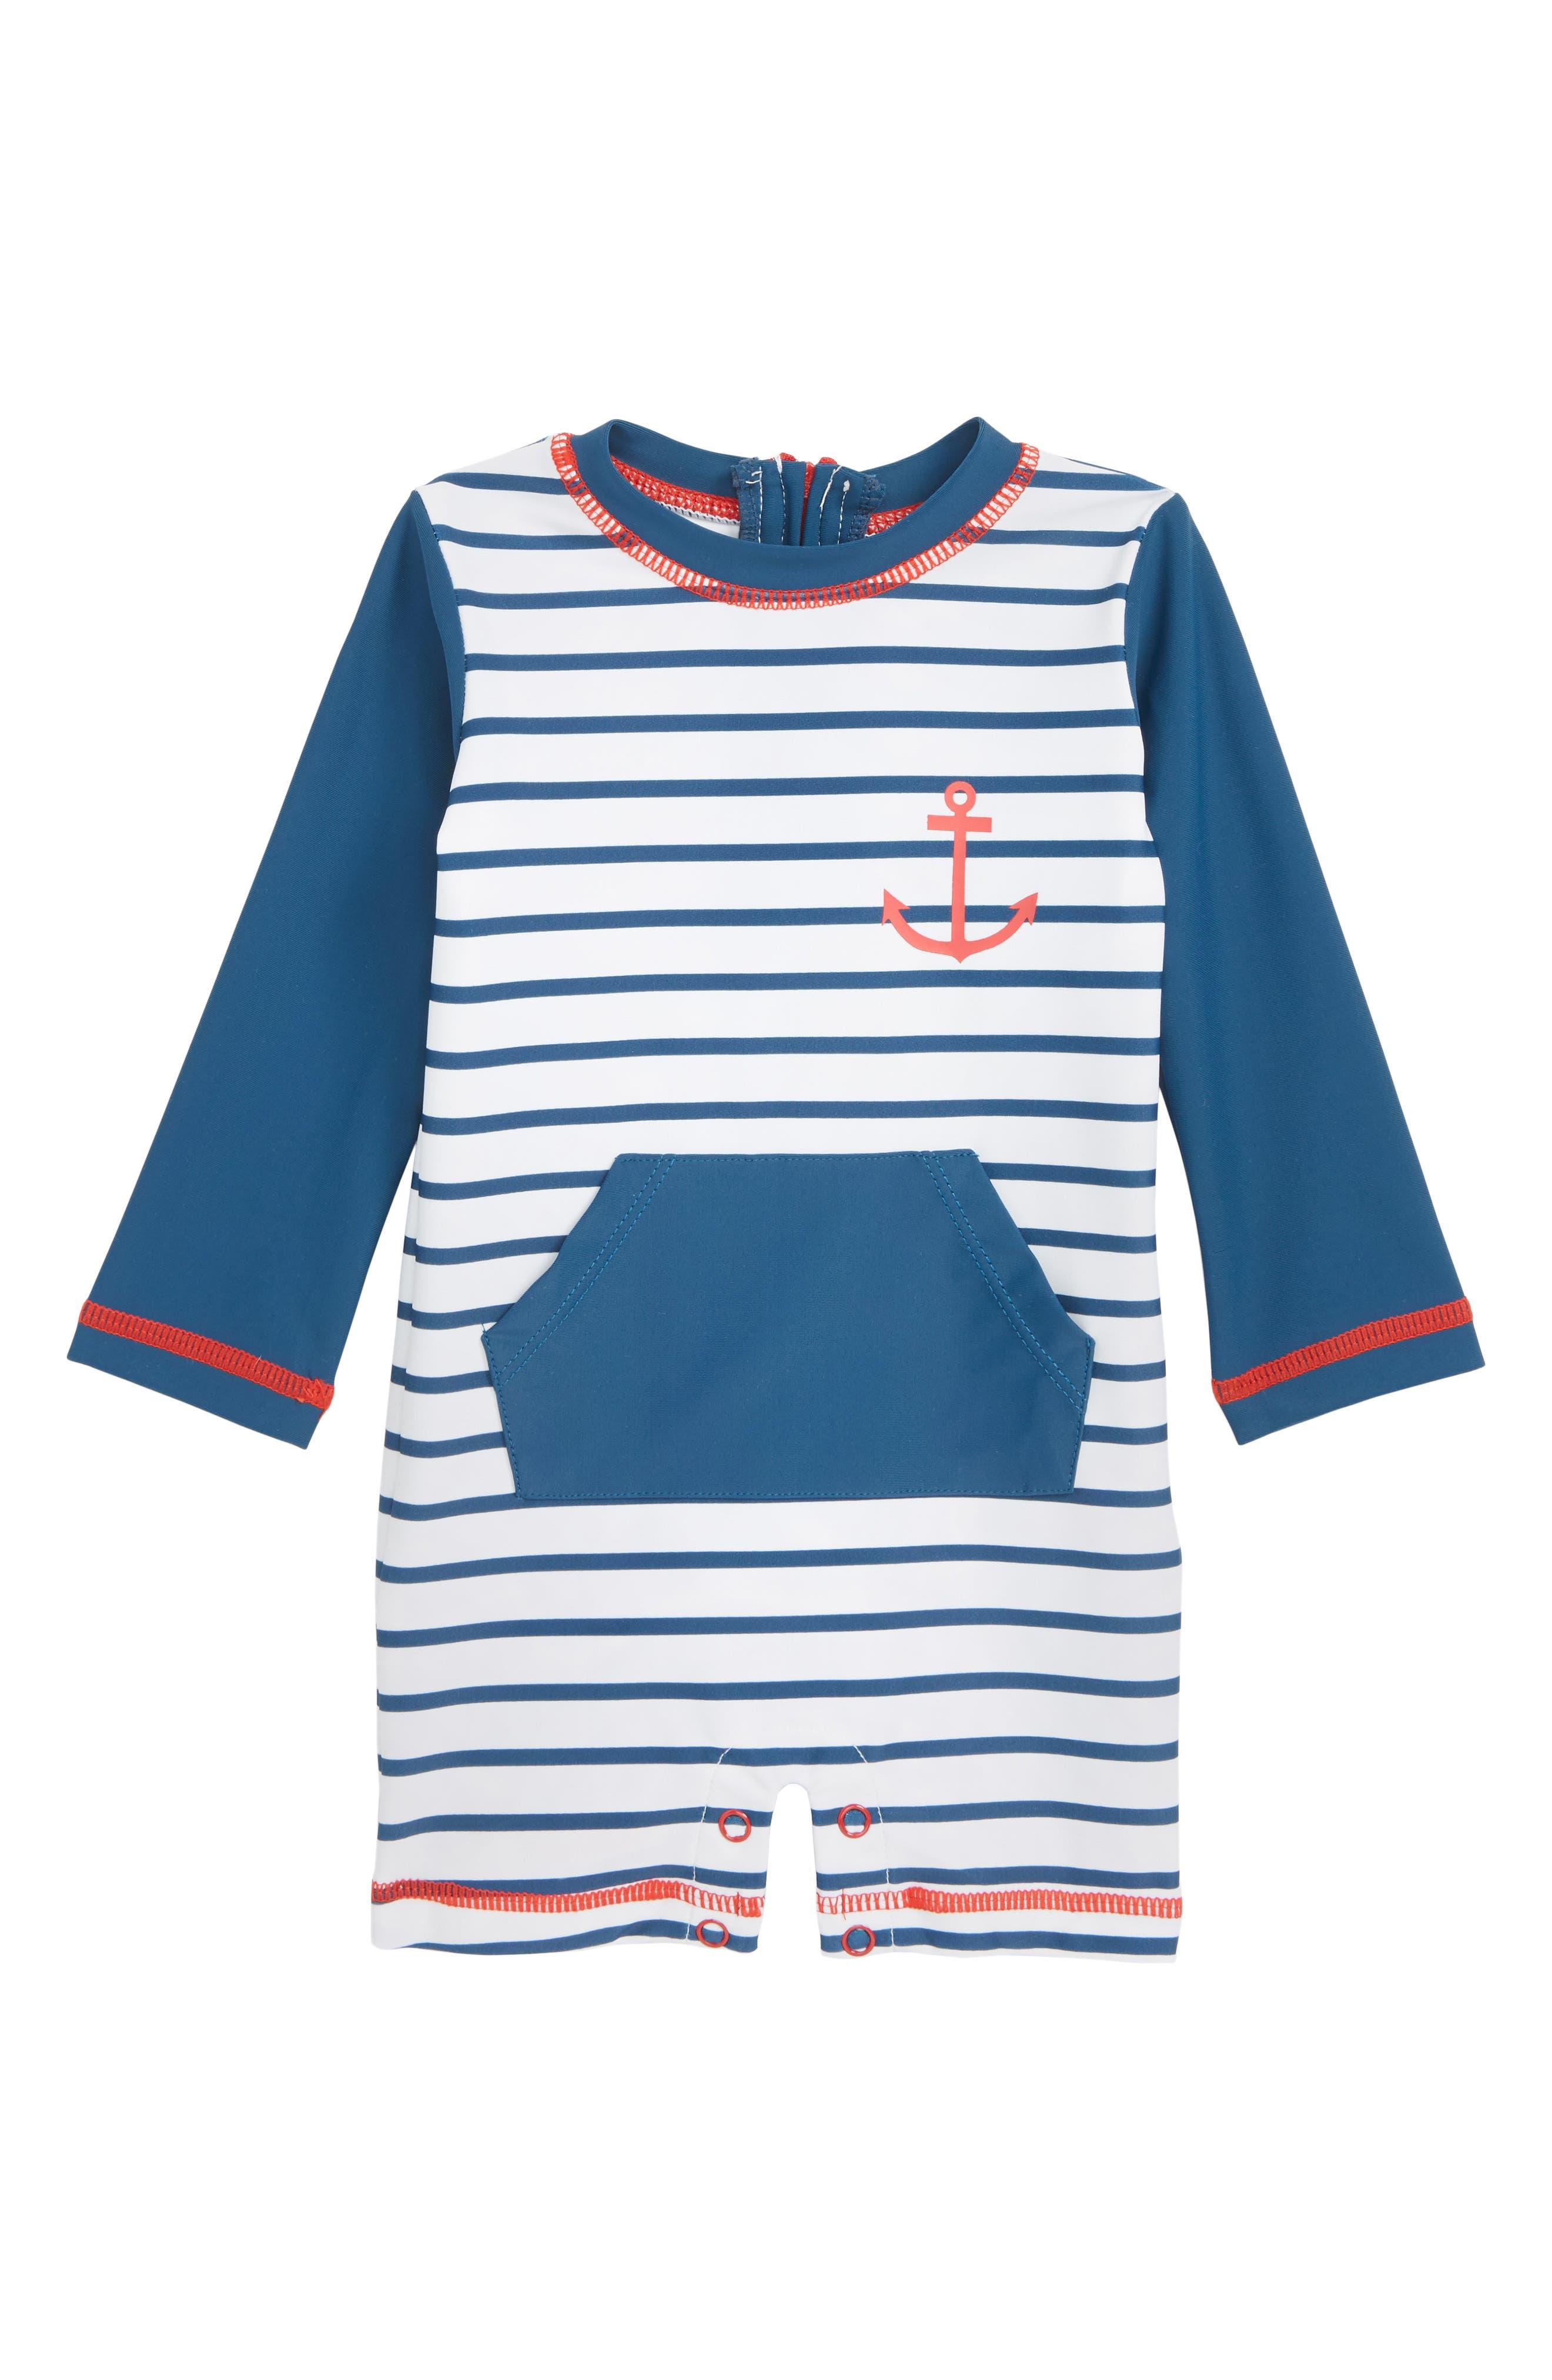 Nautical Stripes One-Piece Rashguard Swimsuit,                             Main thumbnail 1, color,                             WHITE